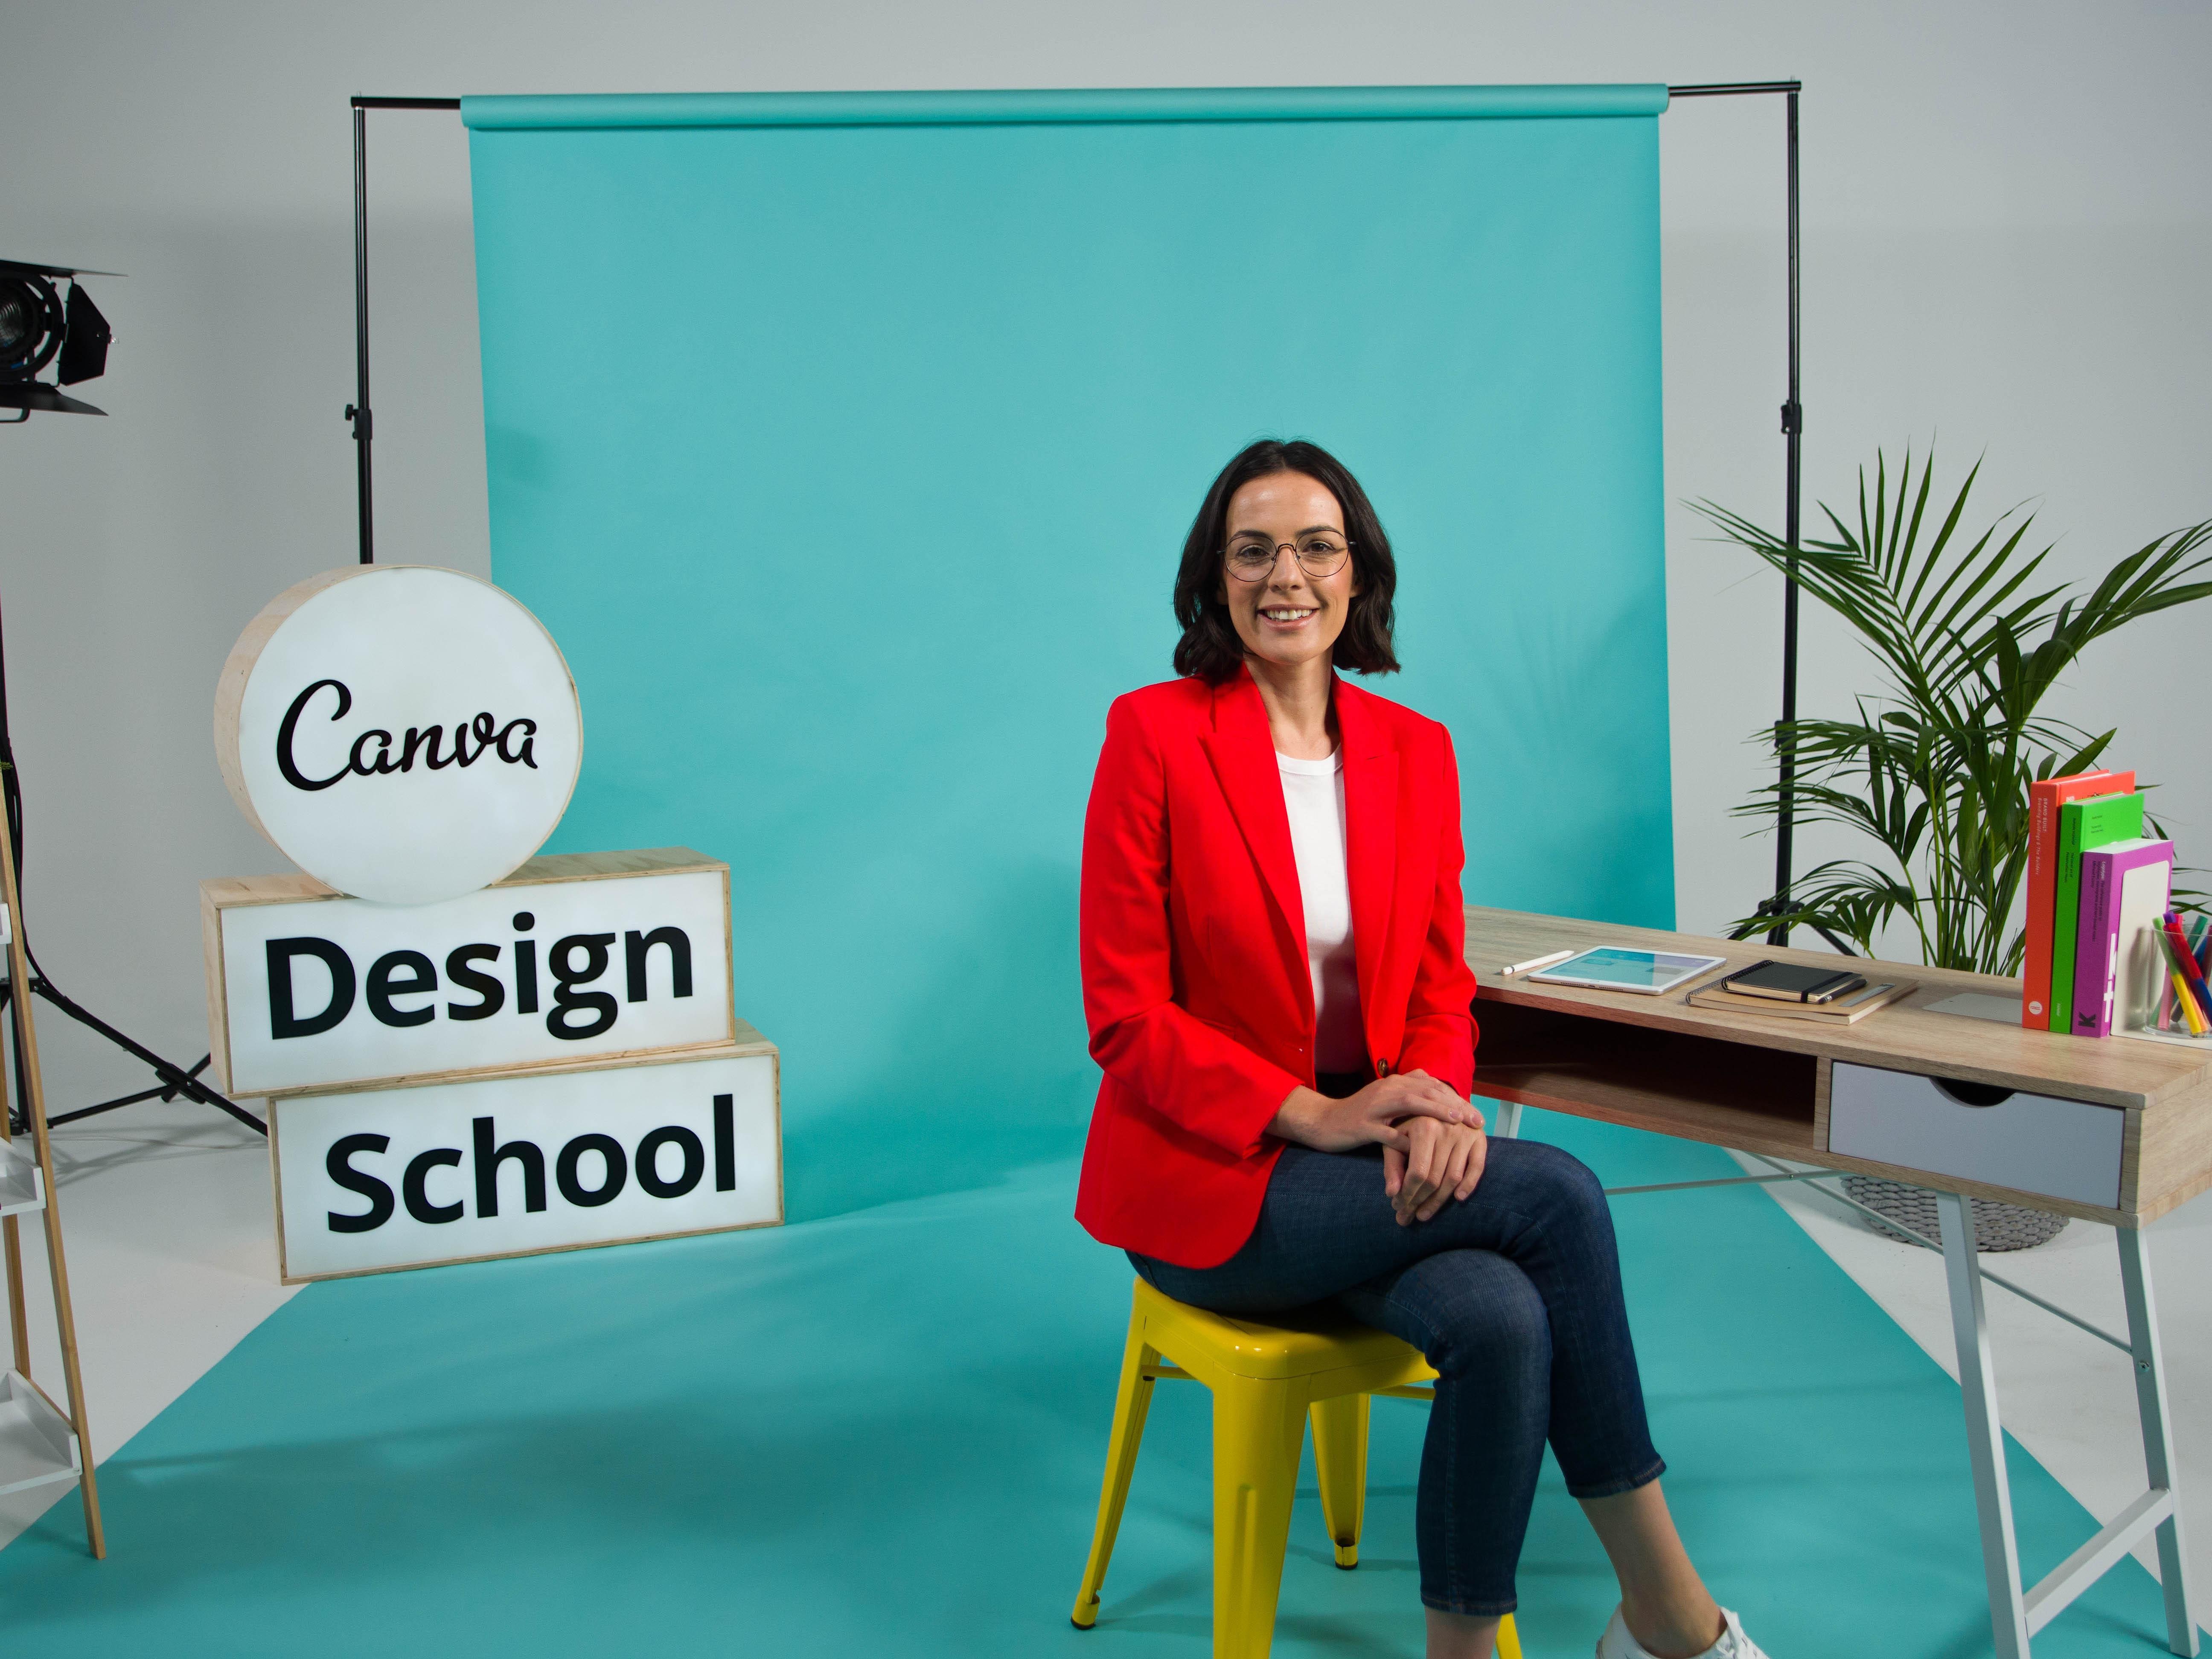 Canva Design School After Hours: Graphic Design Basics